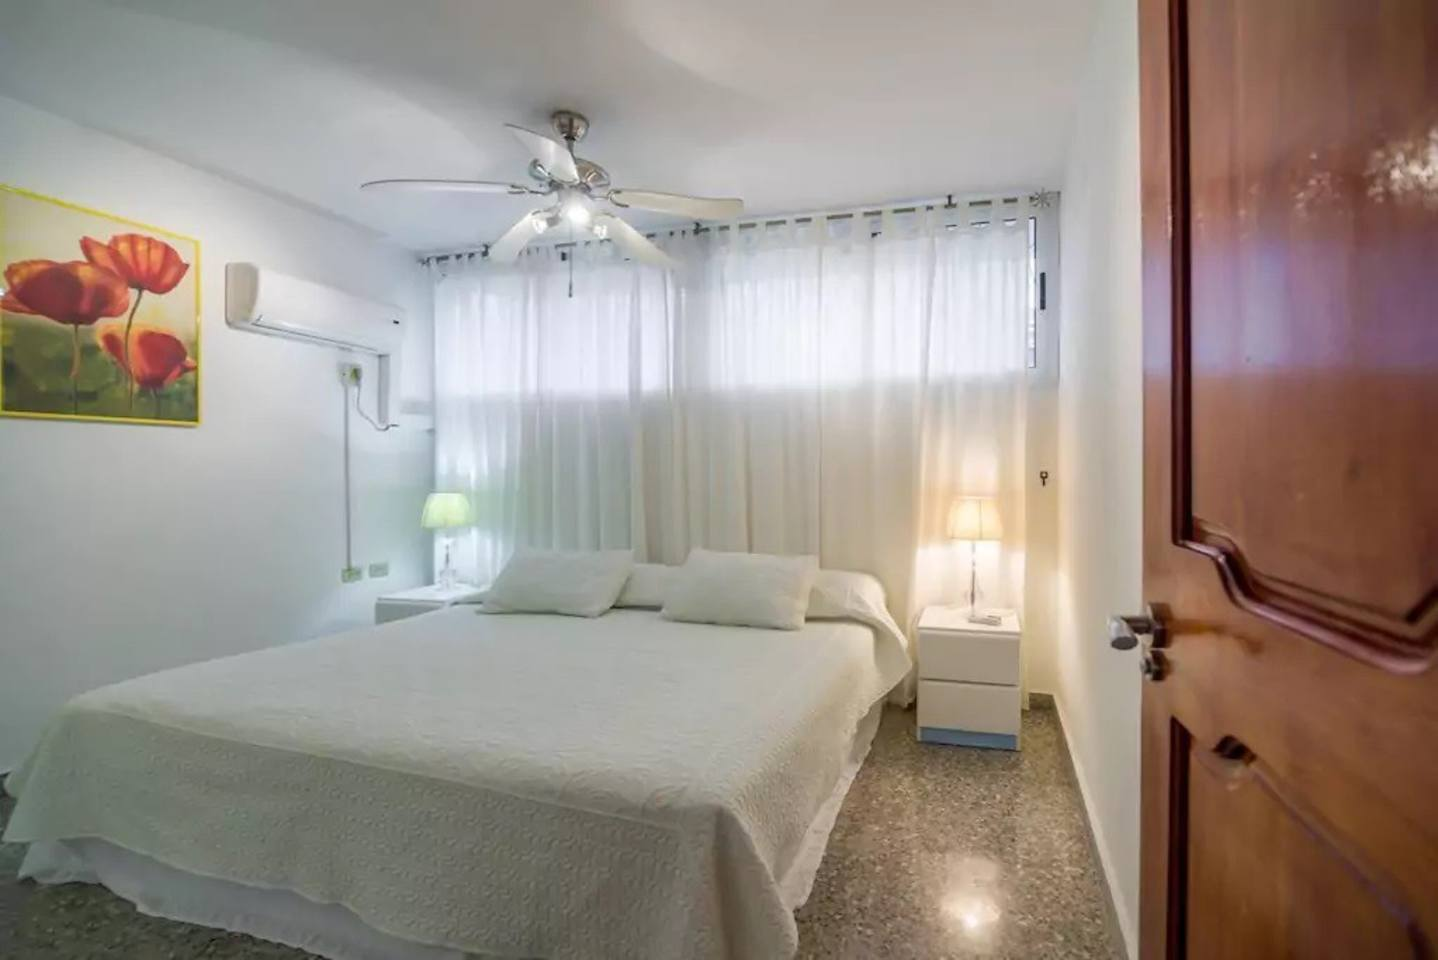 Apartment Villa Don Teto Suite   8 Rooms  Great Havana View photo 16924662